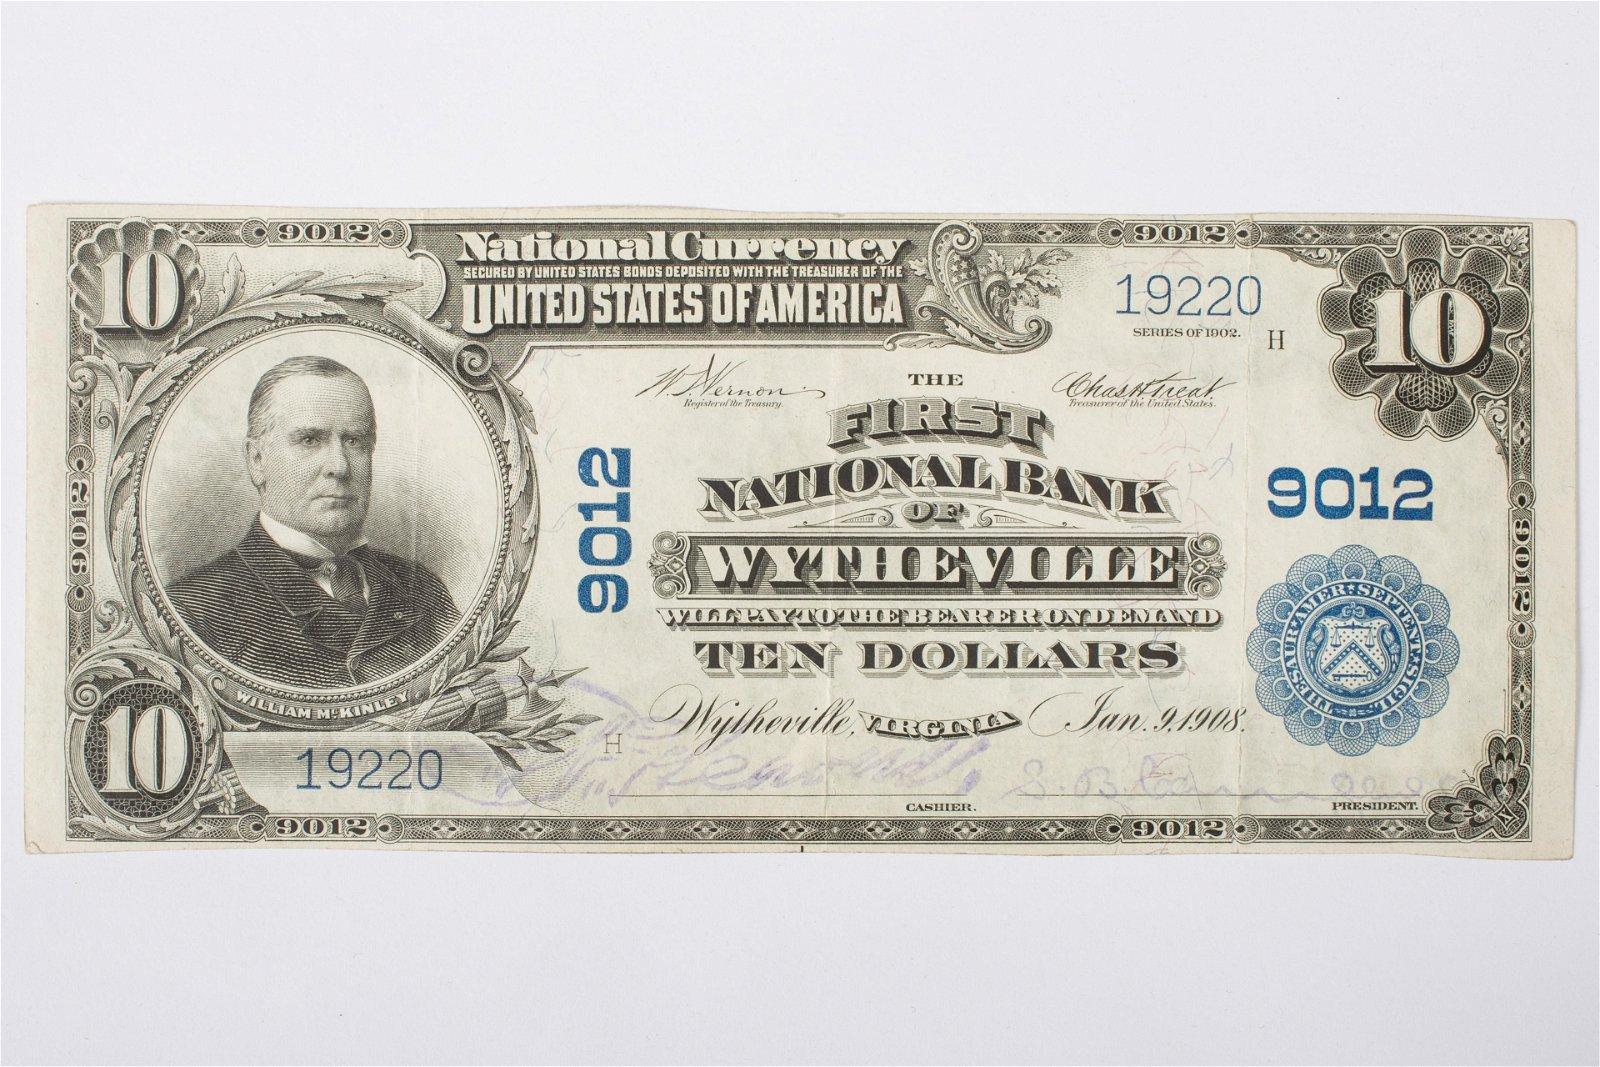 1902 $10 NATIONAL CURRENCY WYTHEVILLE VA